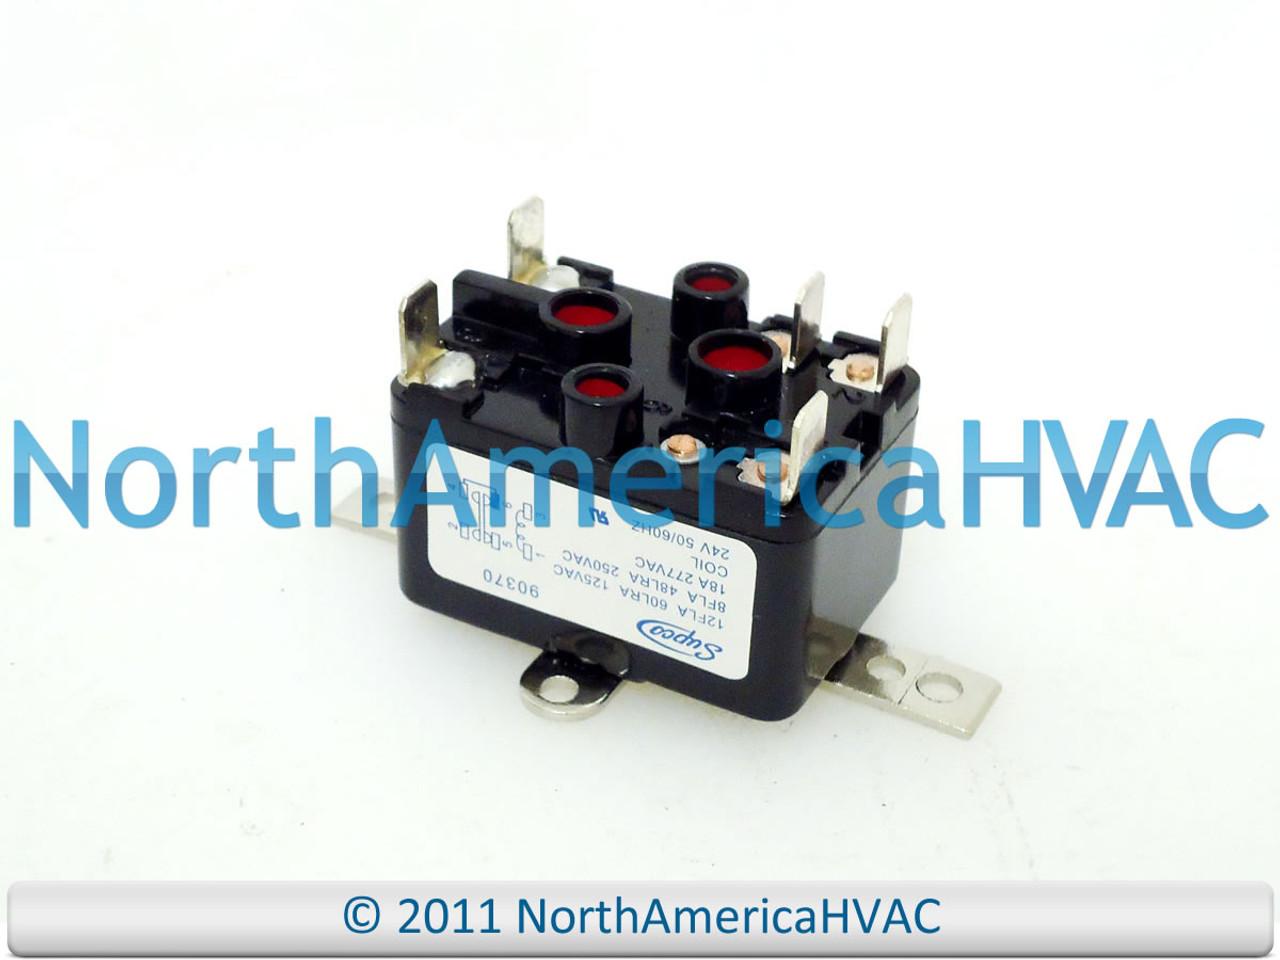 York Coleman Luxaire 24v Furnace Relay 72303281 7230-3281 63132281  6313-2281 - North America HVACNorth America HVAC